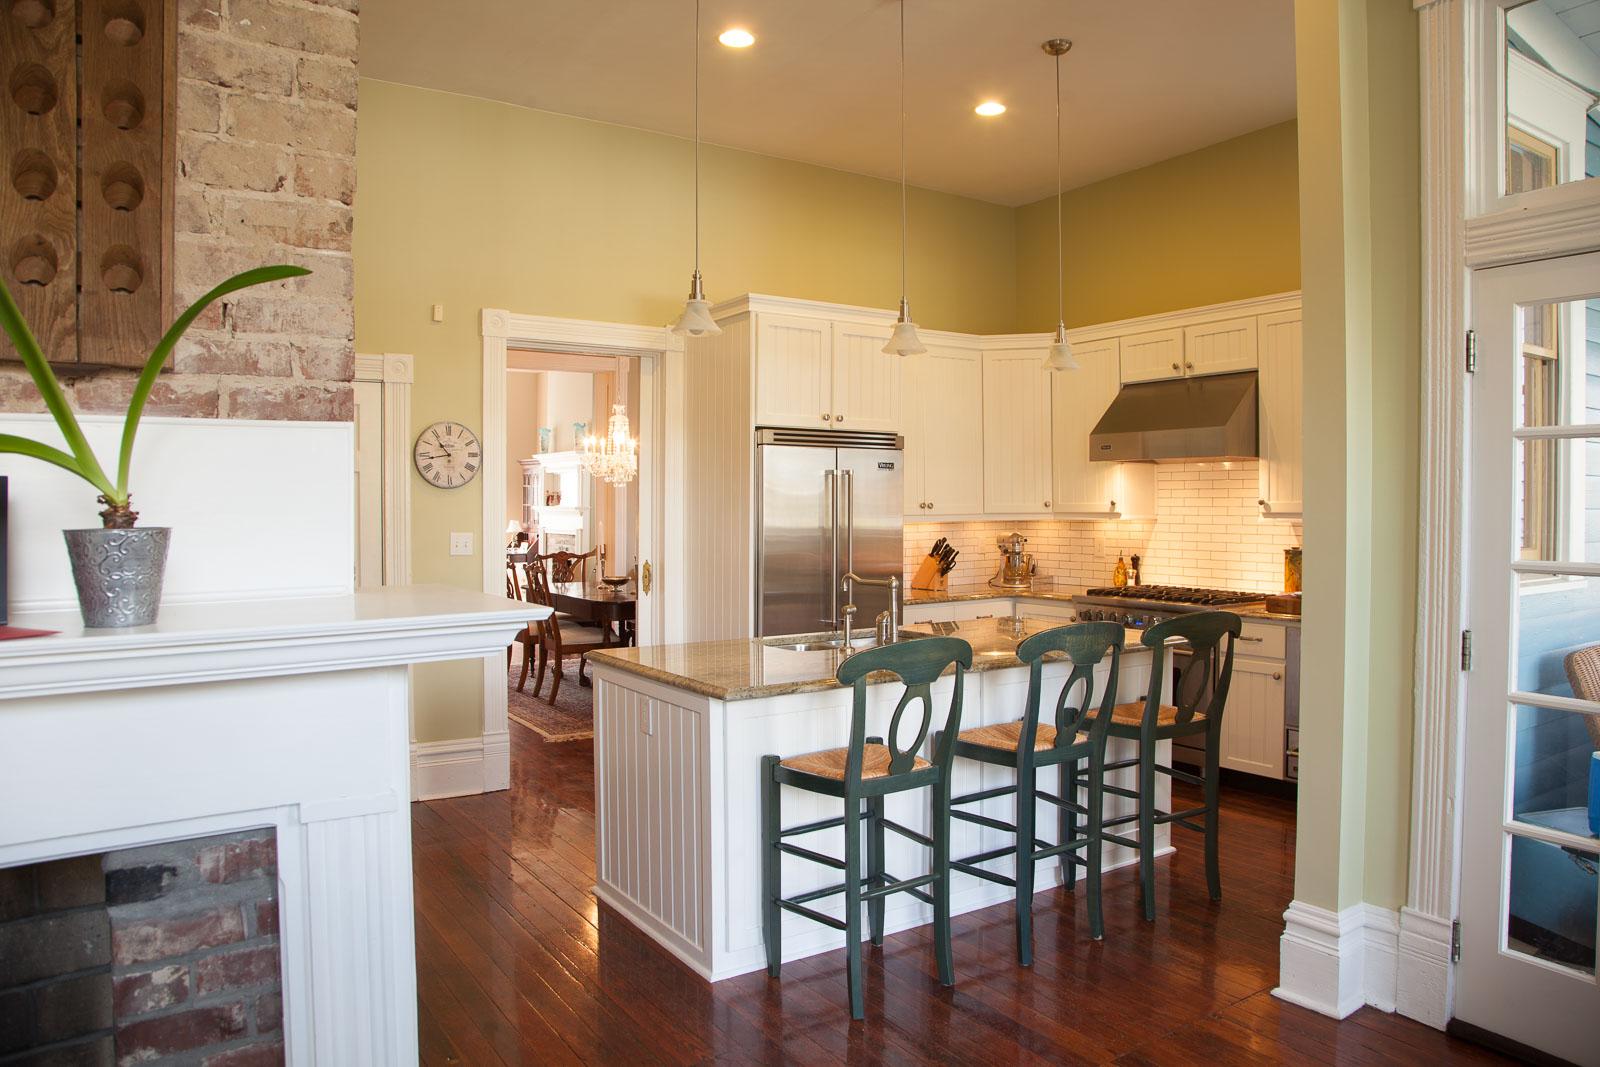 Interior Architecture photography kitchen